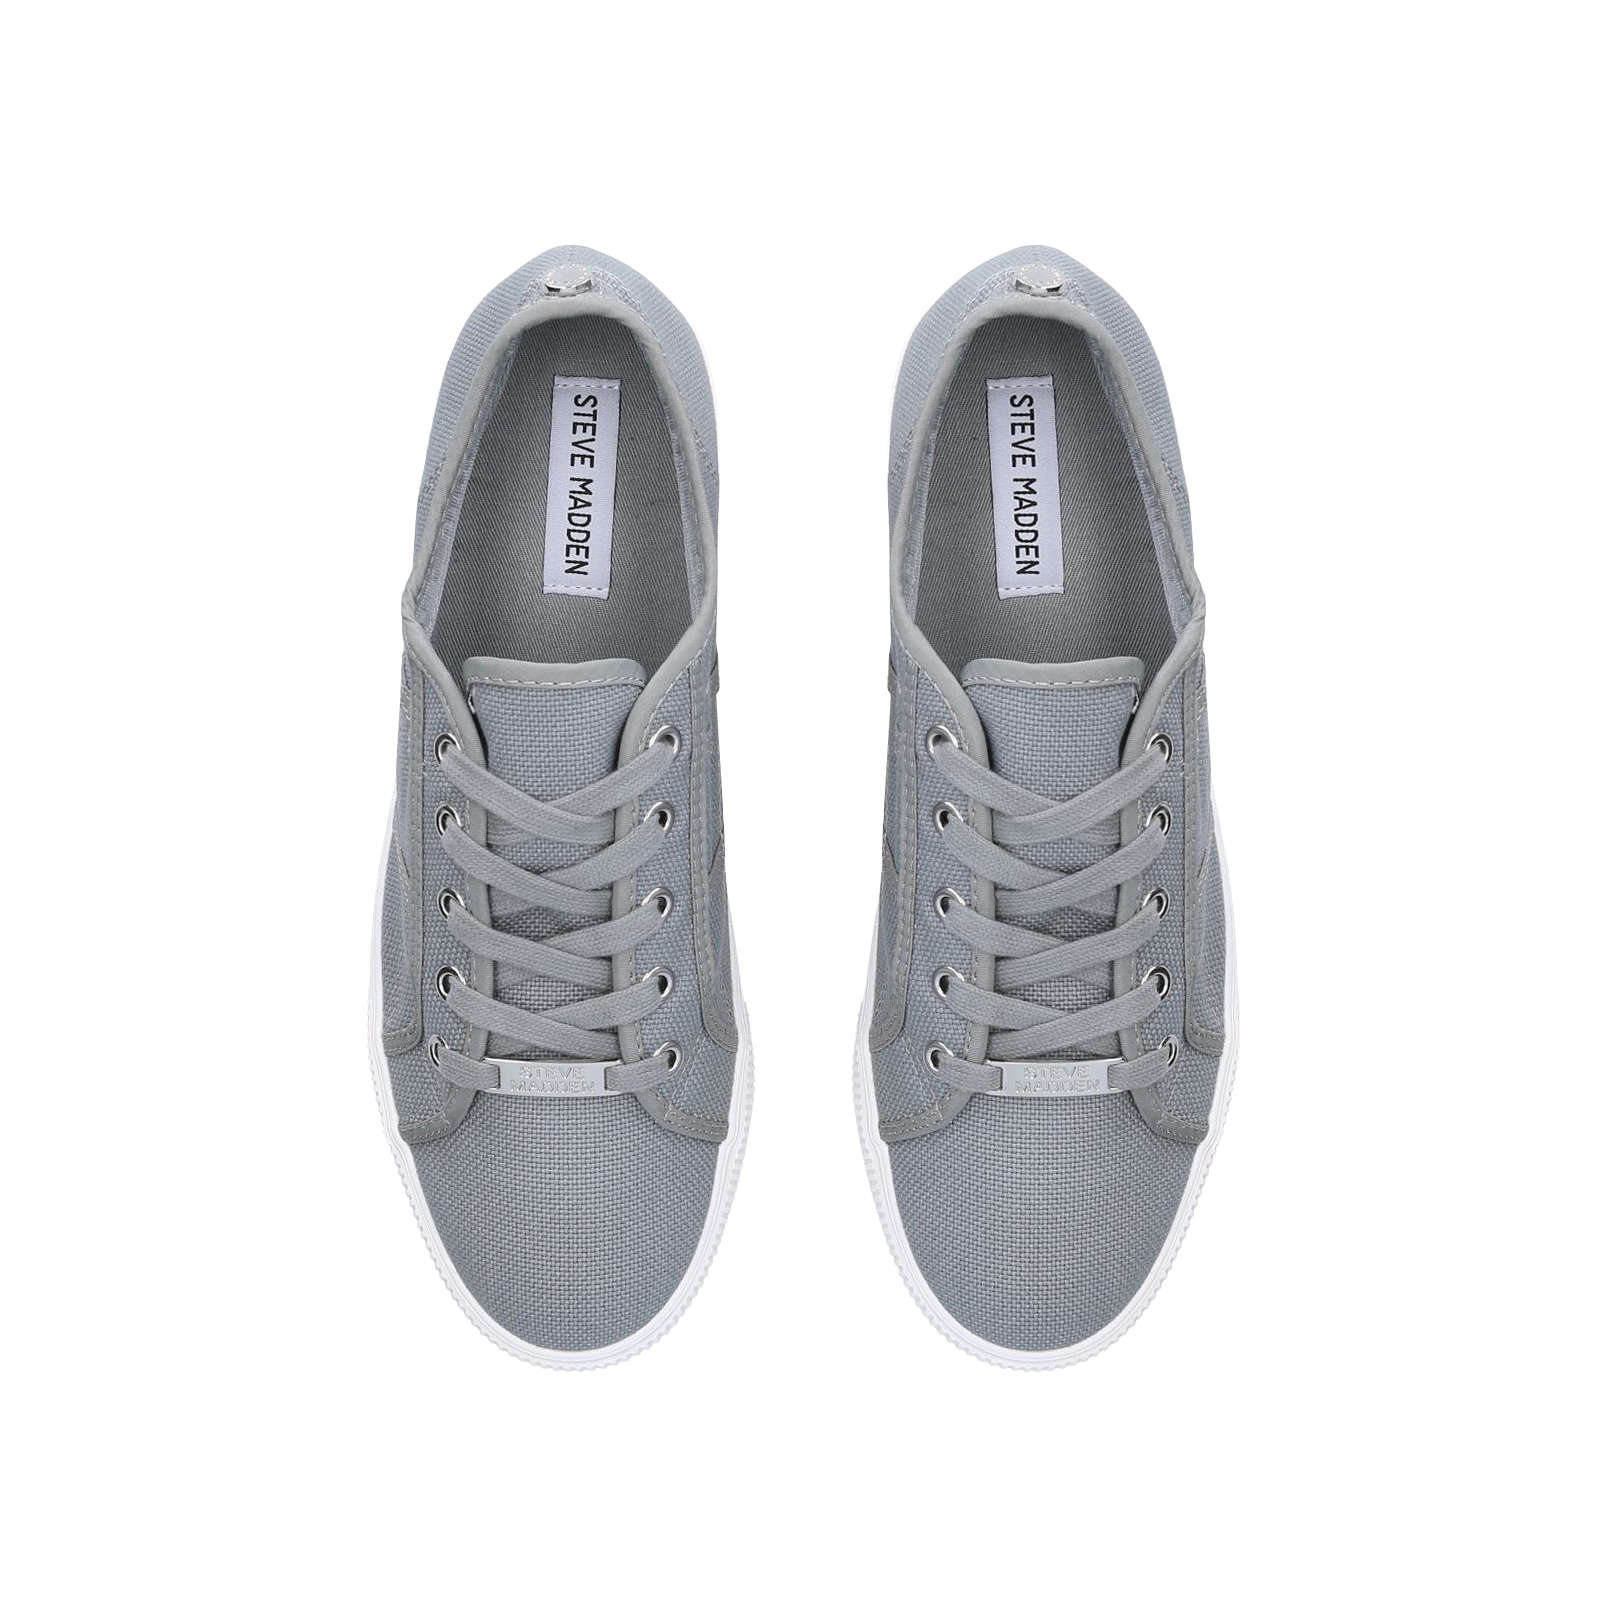 EMMI - STEVE MADDEN Sneakers